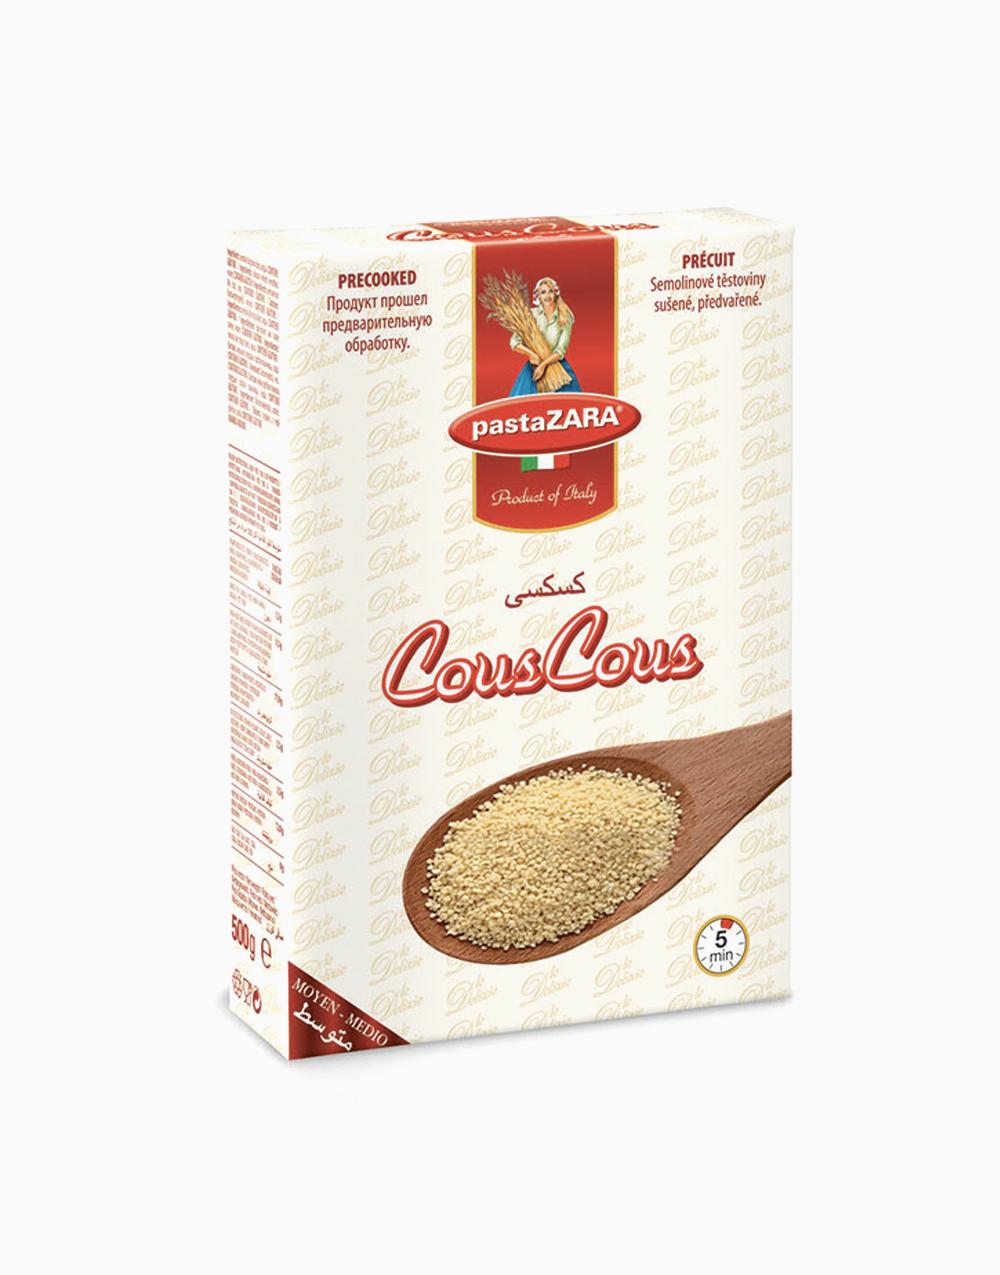 Couscous (500g) by Pasta Zara